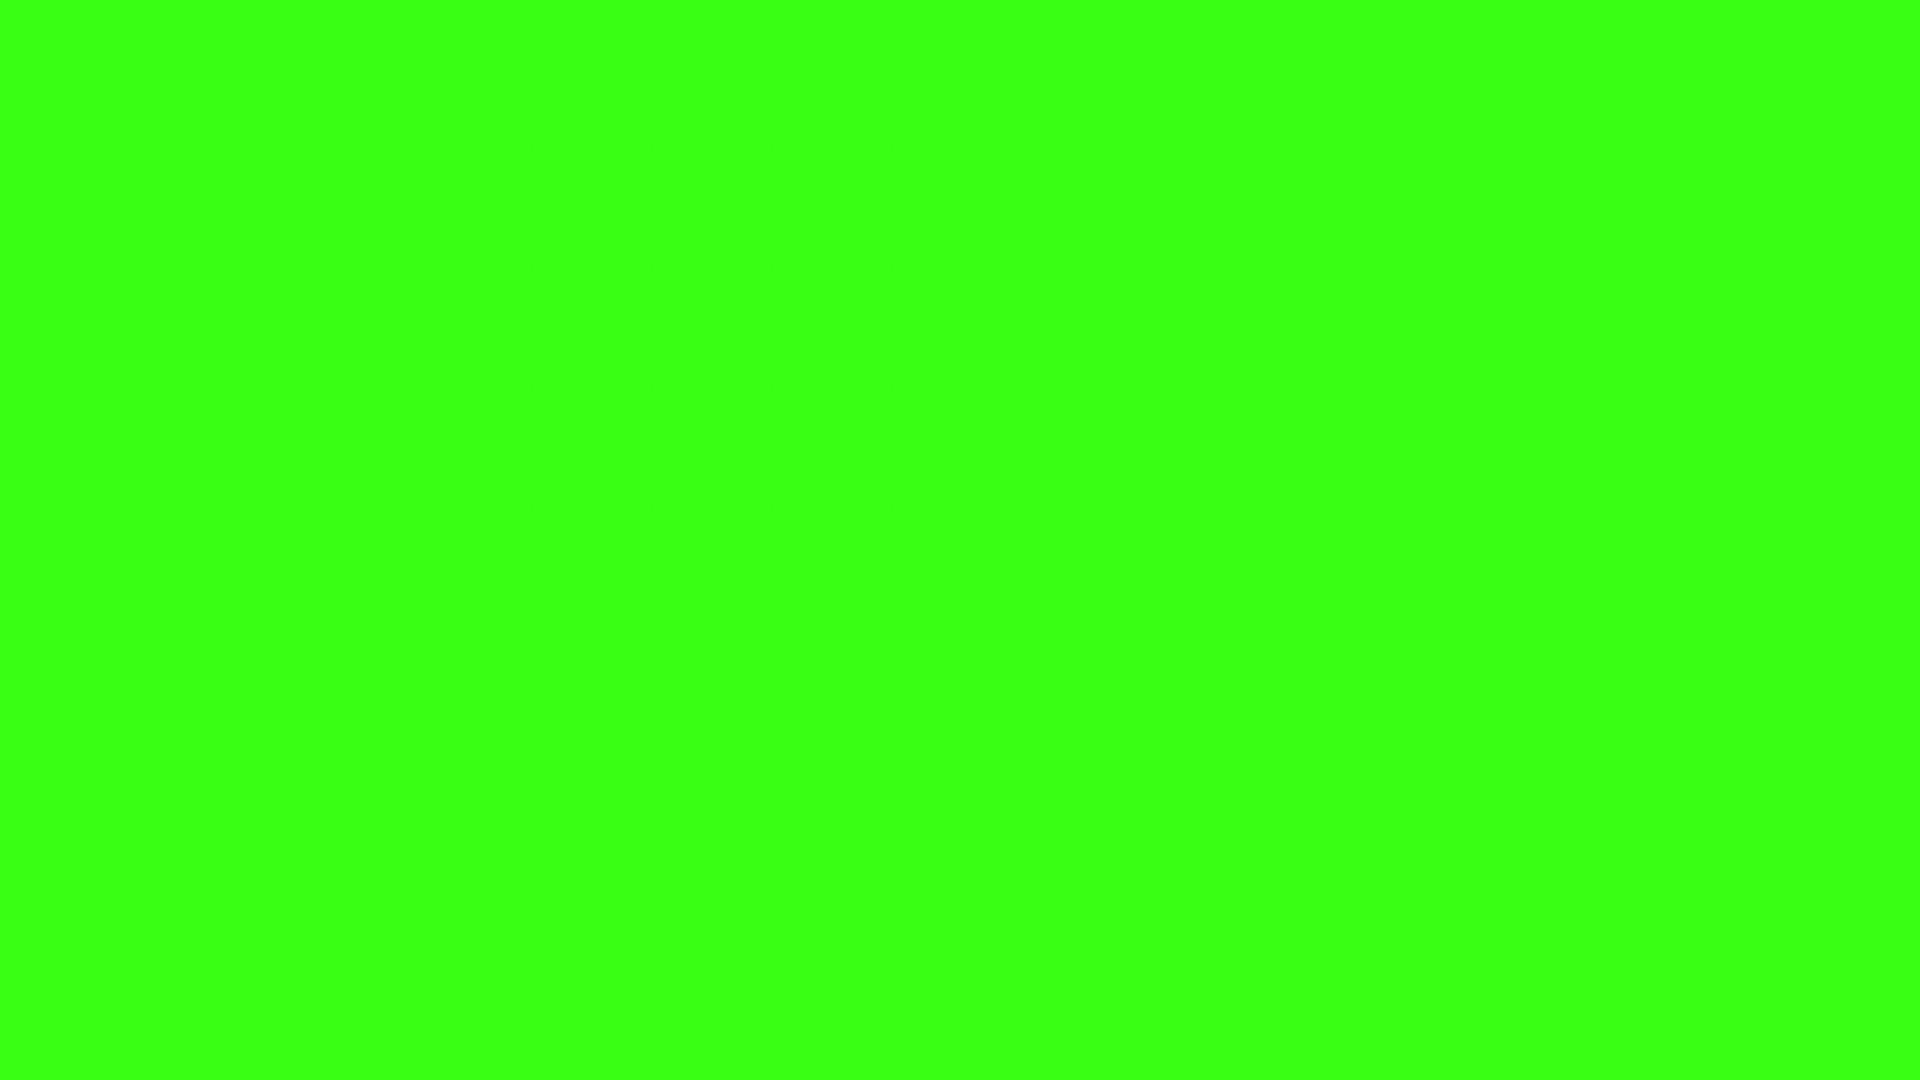 Neon Green Full HD Wallpaper